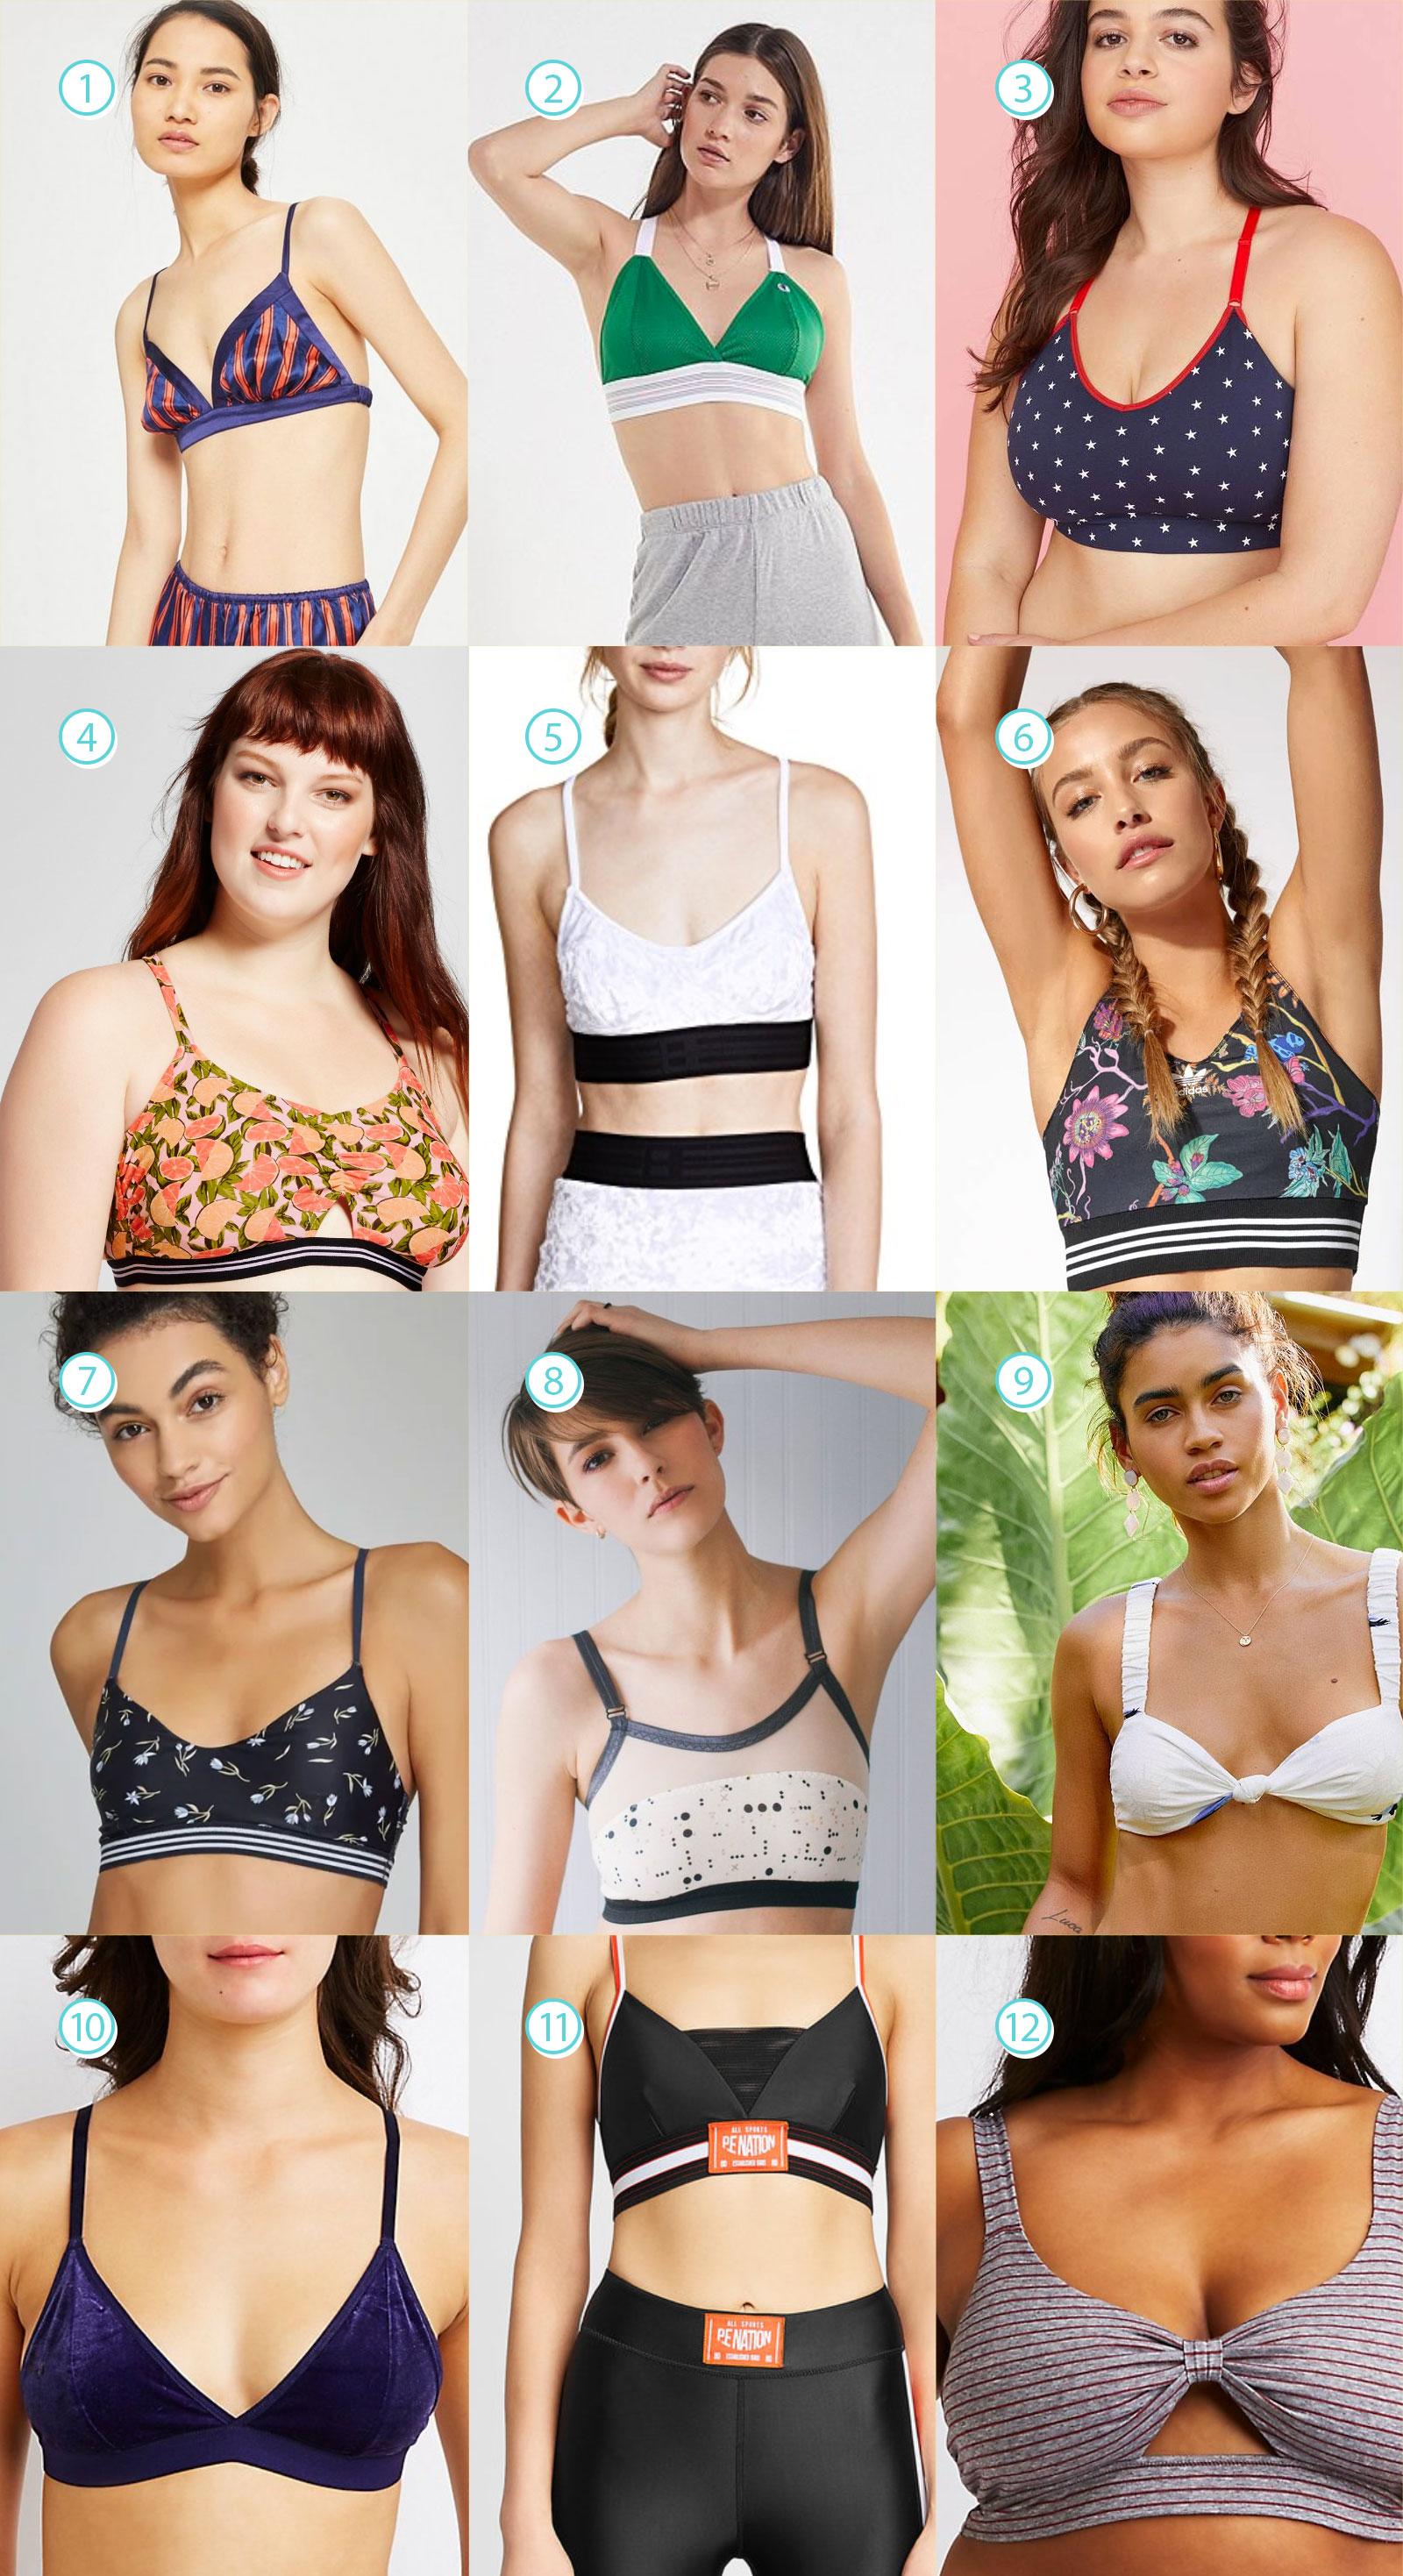 6cd67ab6e4442 Strappy Back Bralette  32.95 4. Xhilaration Women s Plus Size Printed  Bralette Bikini Top  19.99 5. Baja East Velour Sports Bra Top –  118.50